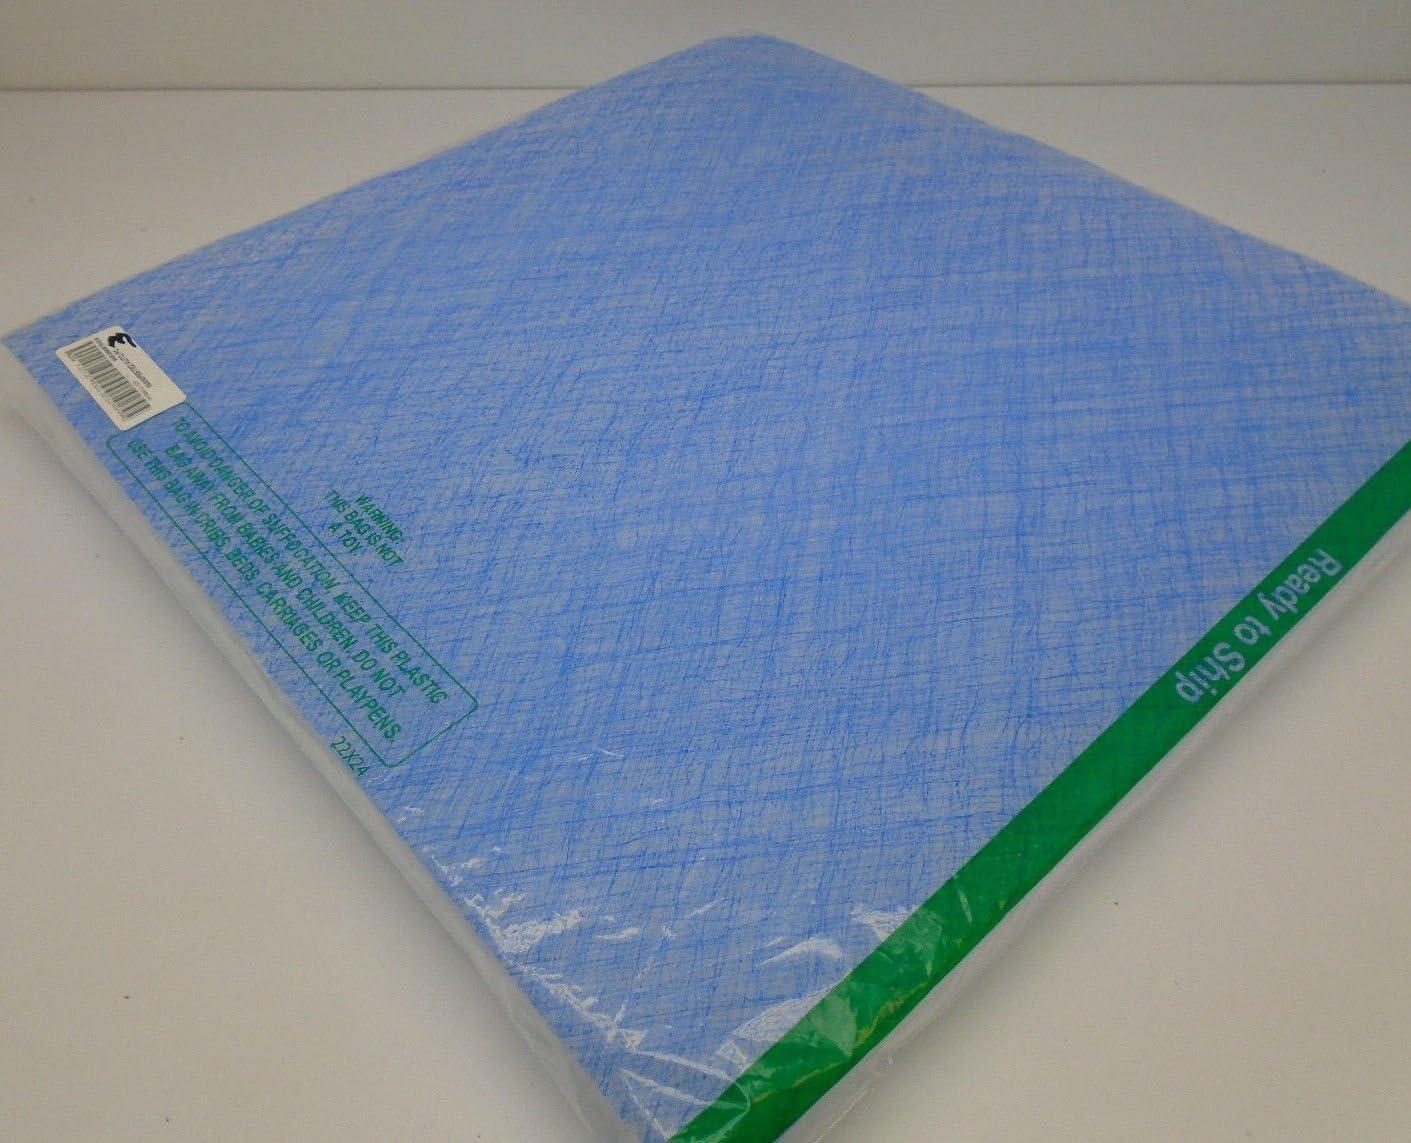 Viskon-Aire 028-203 SG-15 Green 20 x 25 x 2.5 Fiberglass Paint Arrestor 15g Pad